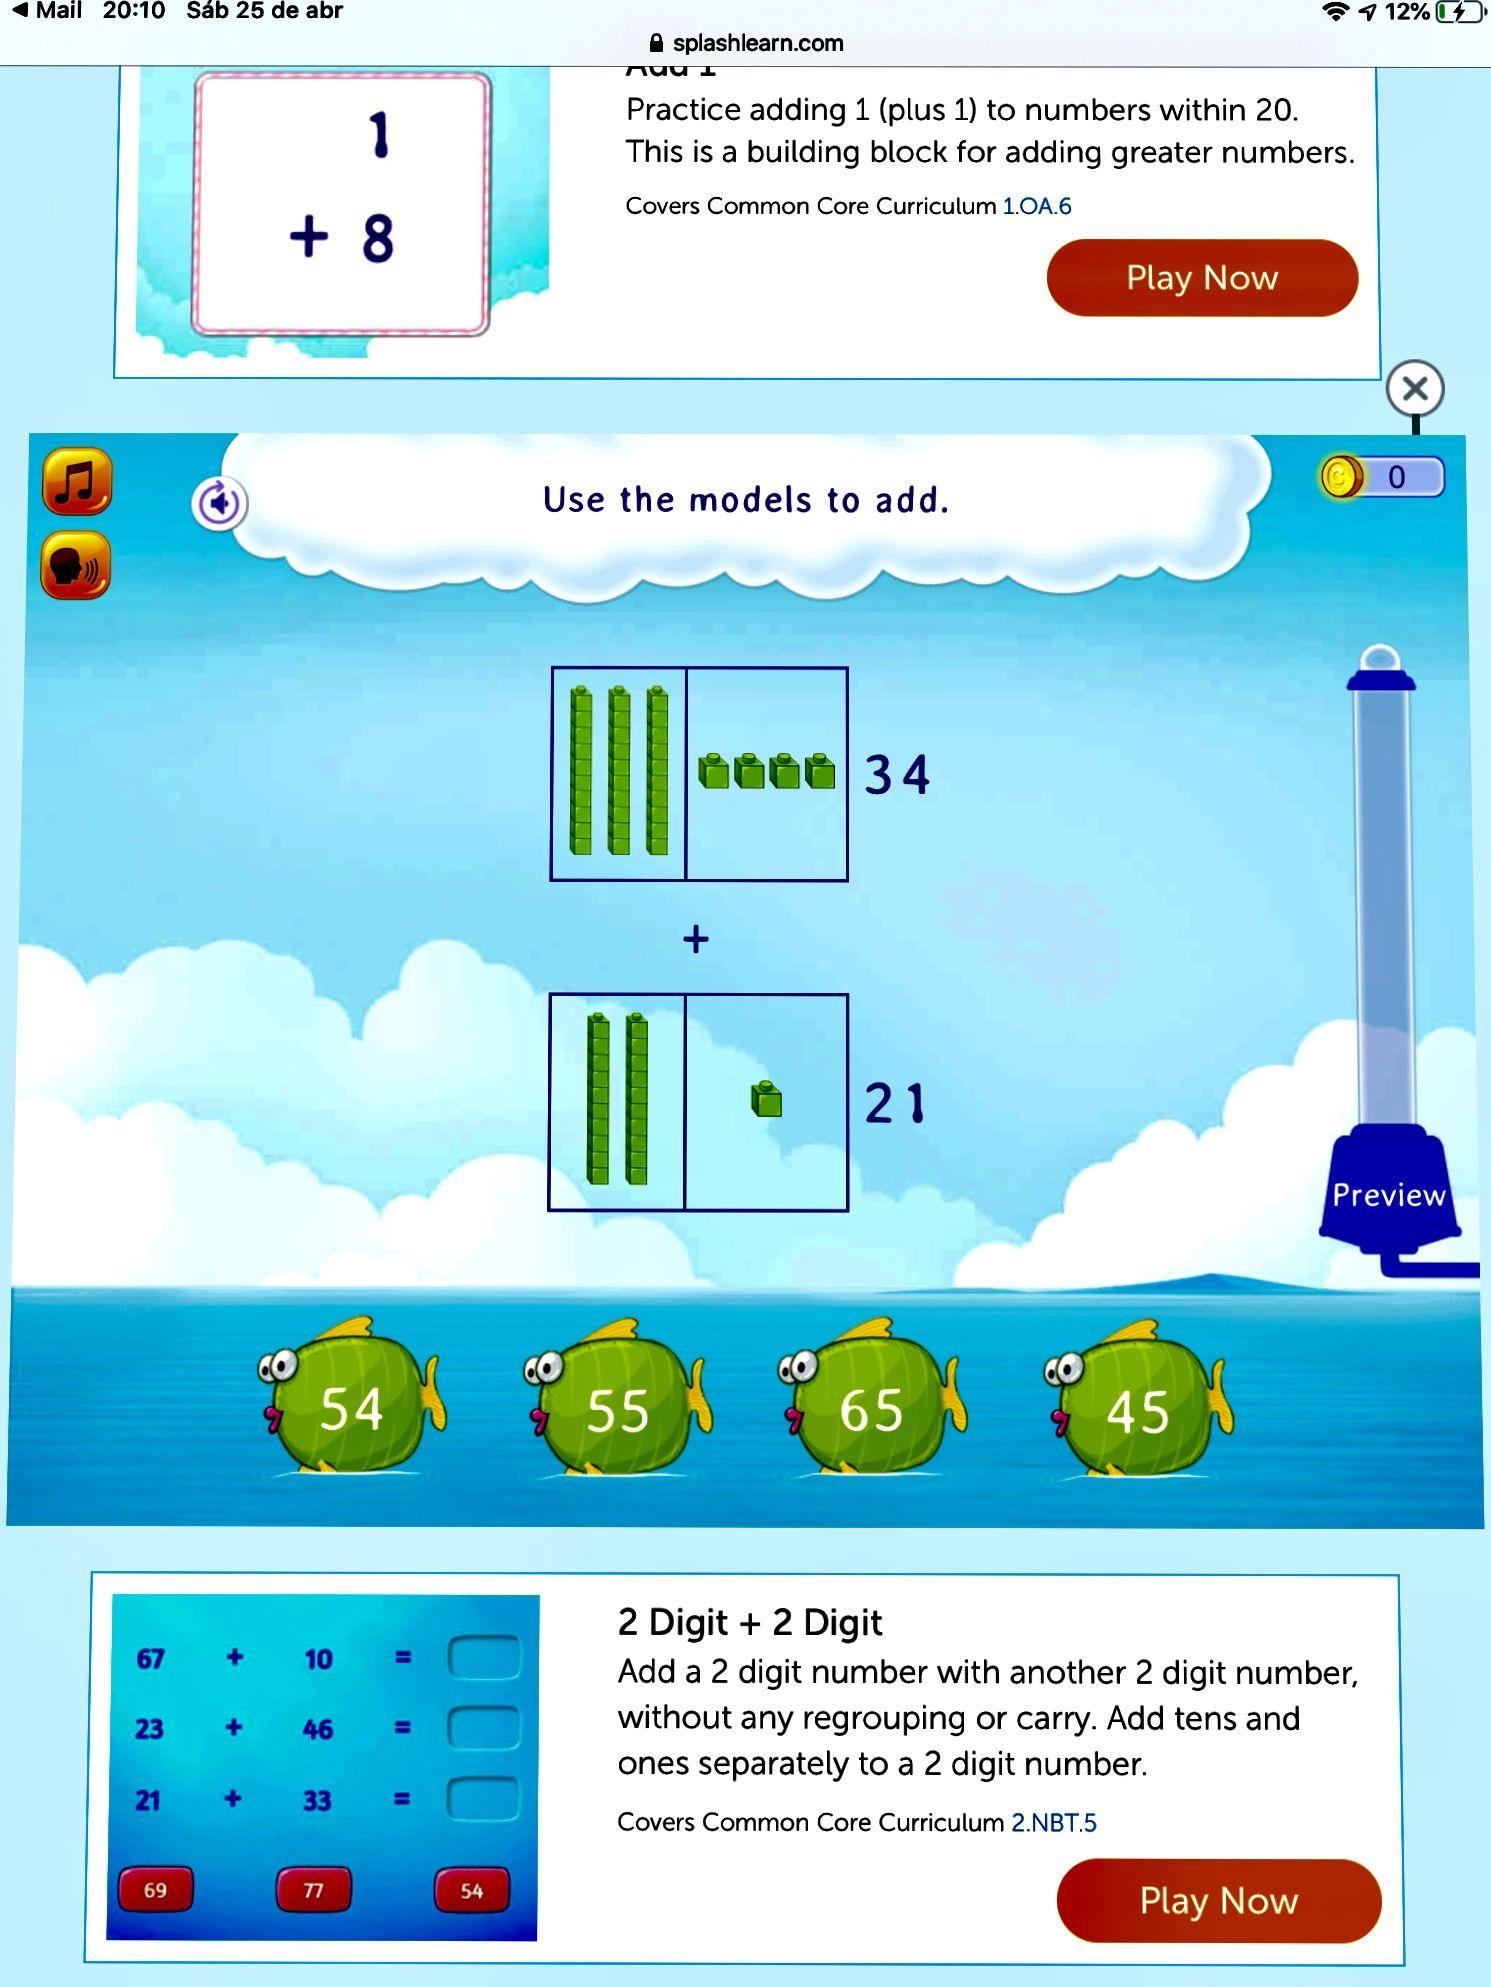 Addition Games For Kids Online Splashlearn Online Games For Kids Math Addition Games Addition Games Addition to games online